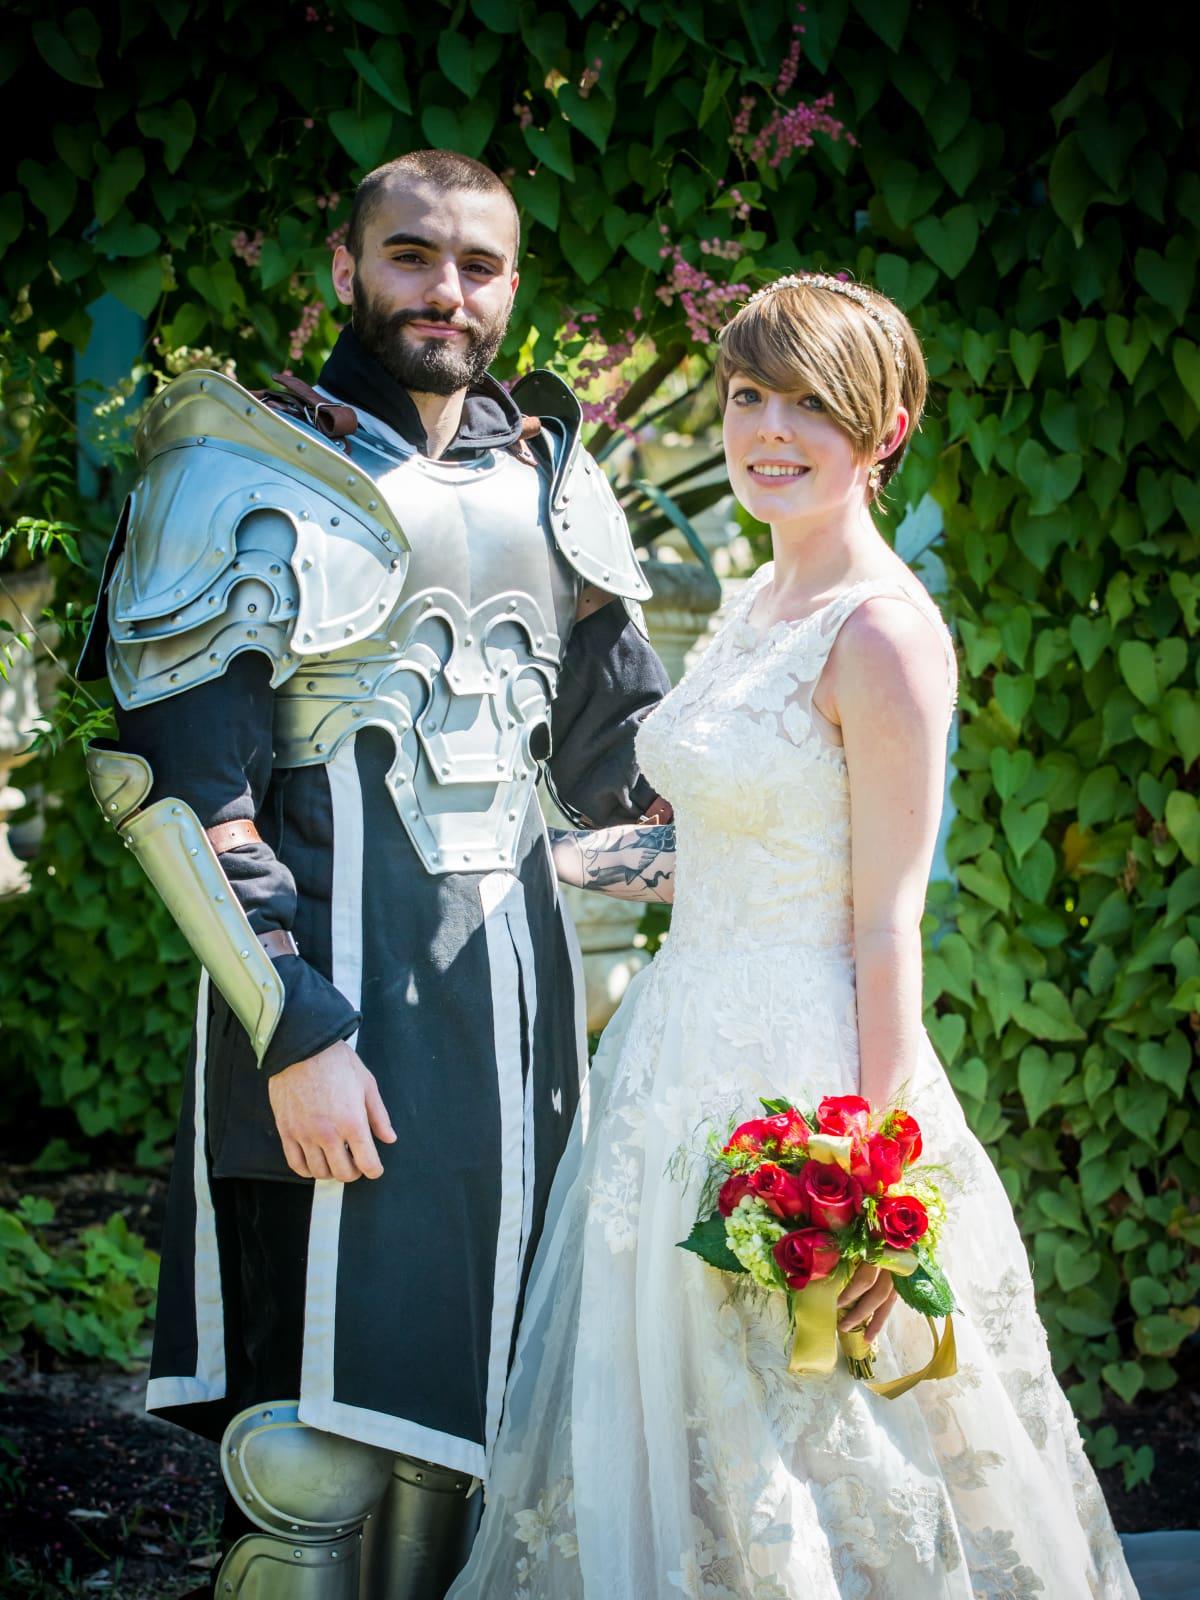 Renaissance Festival Weddings, Feb. 2016 Kalleub Carpenter, Ariel Timmons